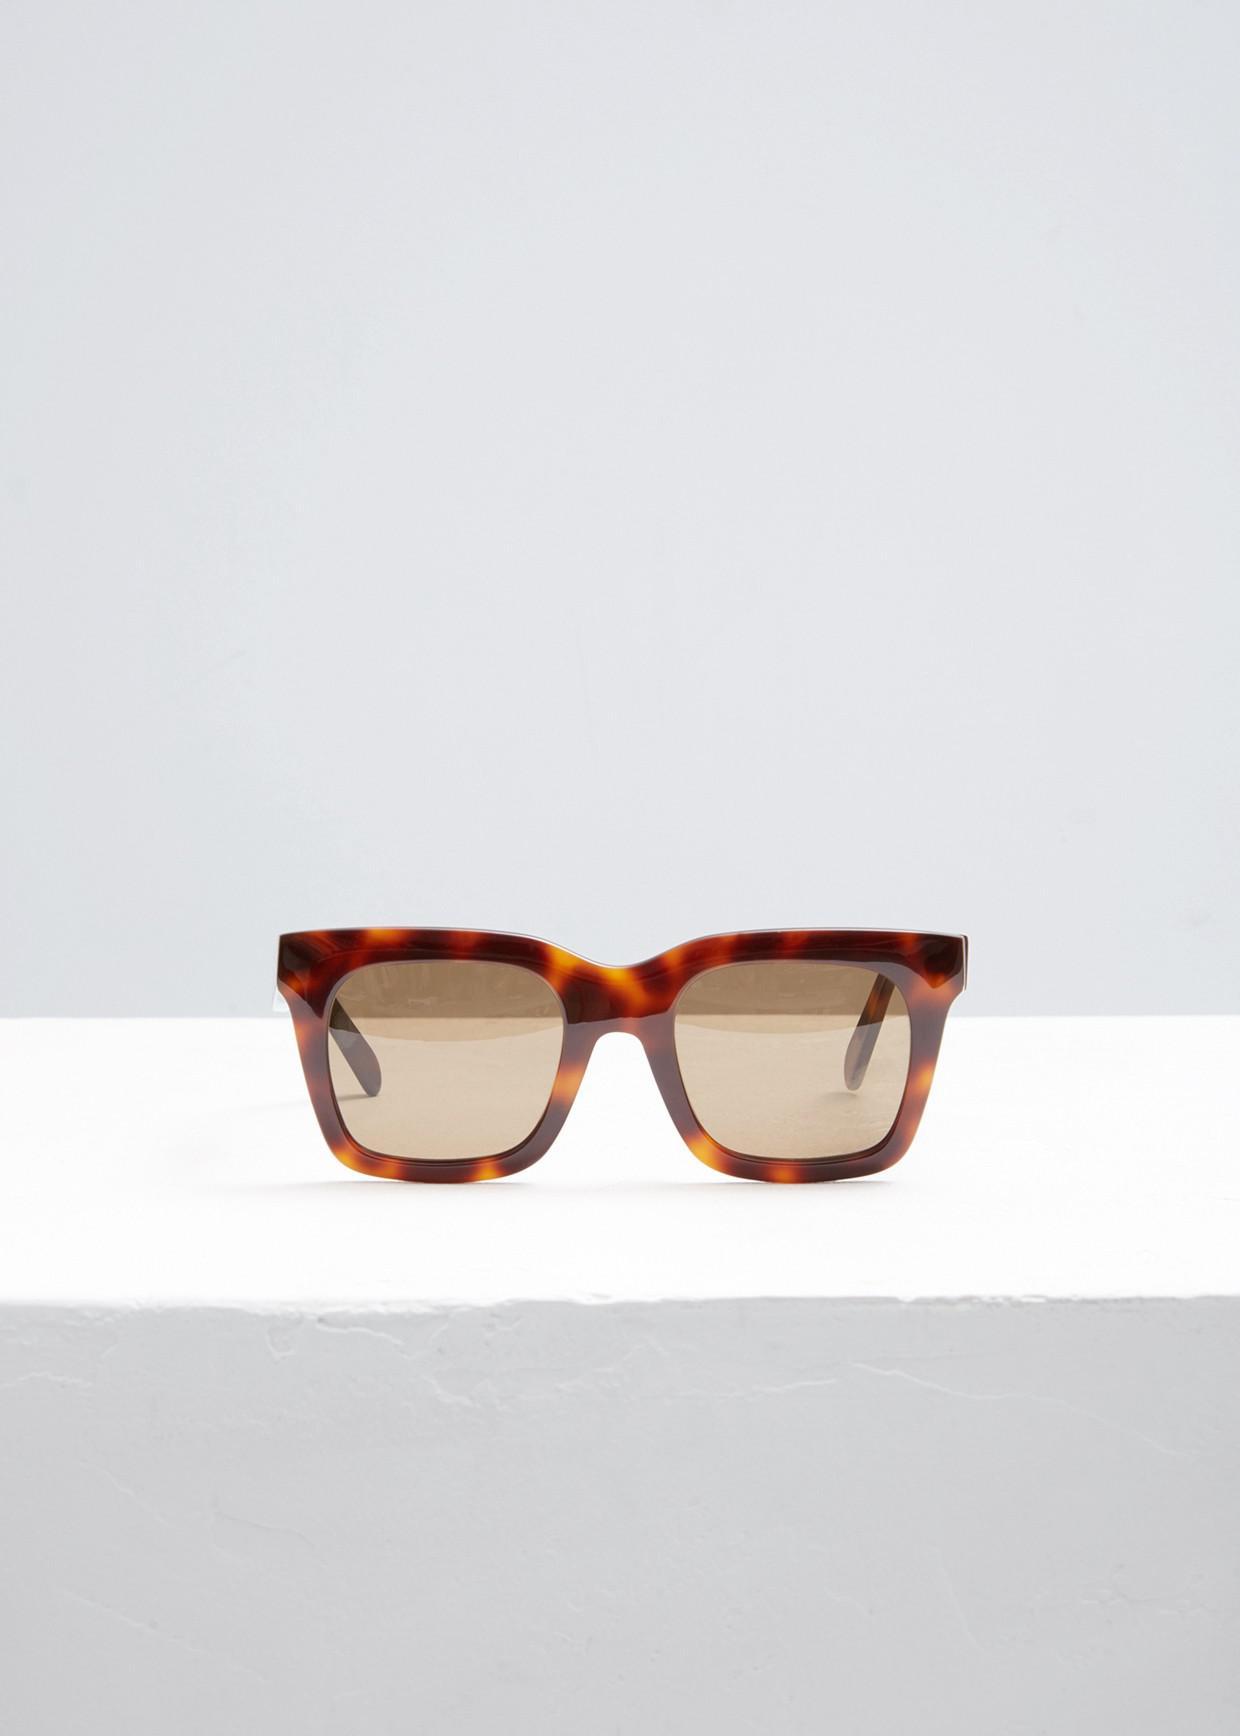 9d730990061 Lyst - Céline 41411 f s Sunglasses in Brown for Men